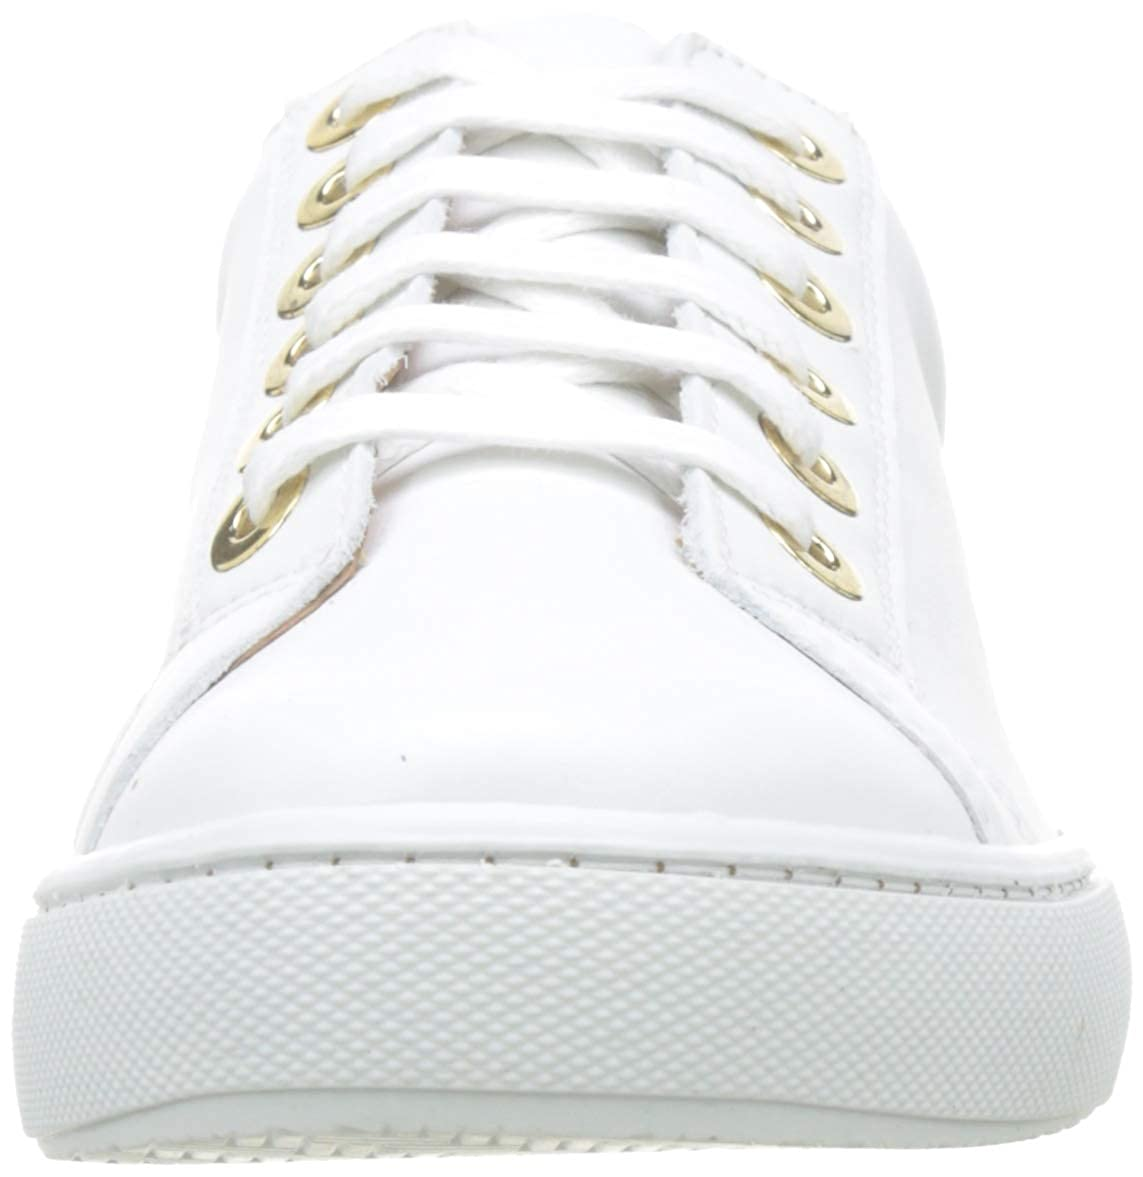 Bensimon Tennis Tennis Tennis Lacets Crantees, scarpe da ginnastica Donna 562546